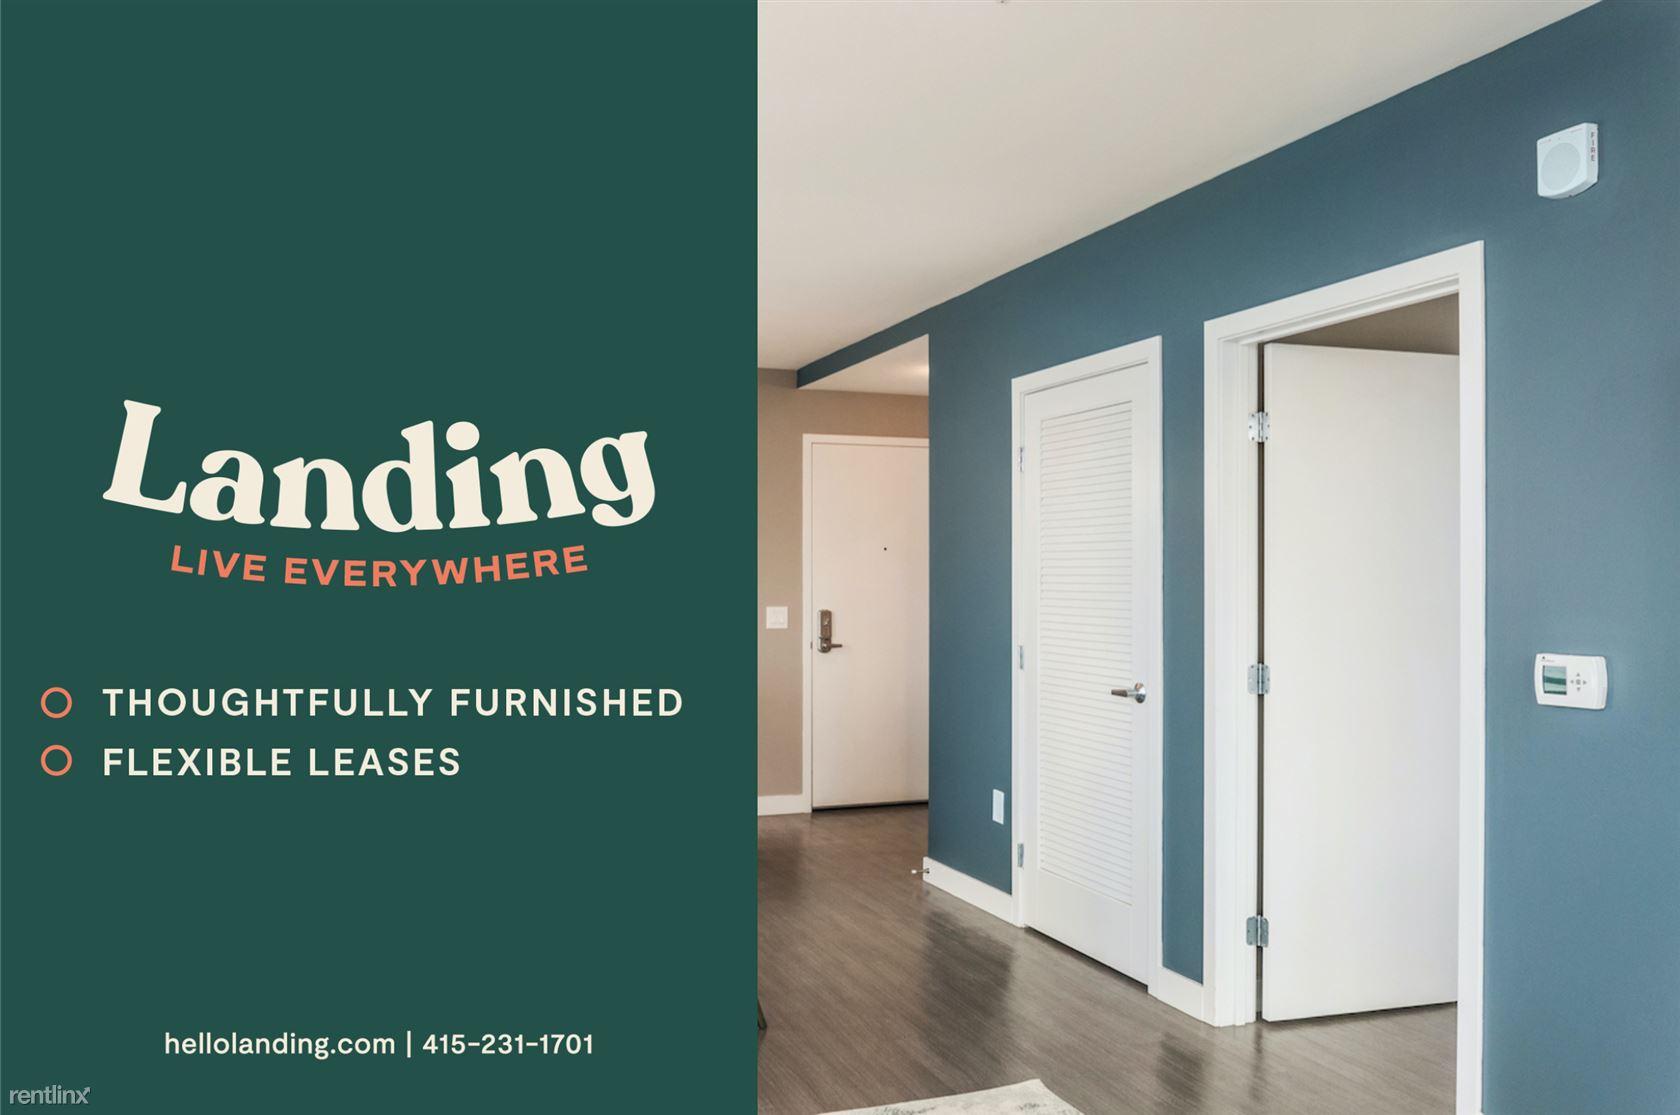 135 Reynoldsburg - New Albany Rd S, Reynoldsburg, OH - $1,289